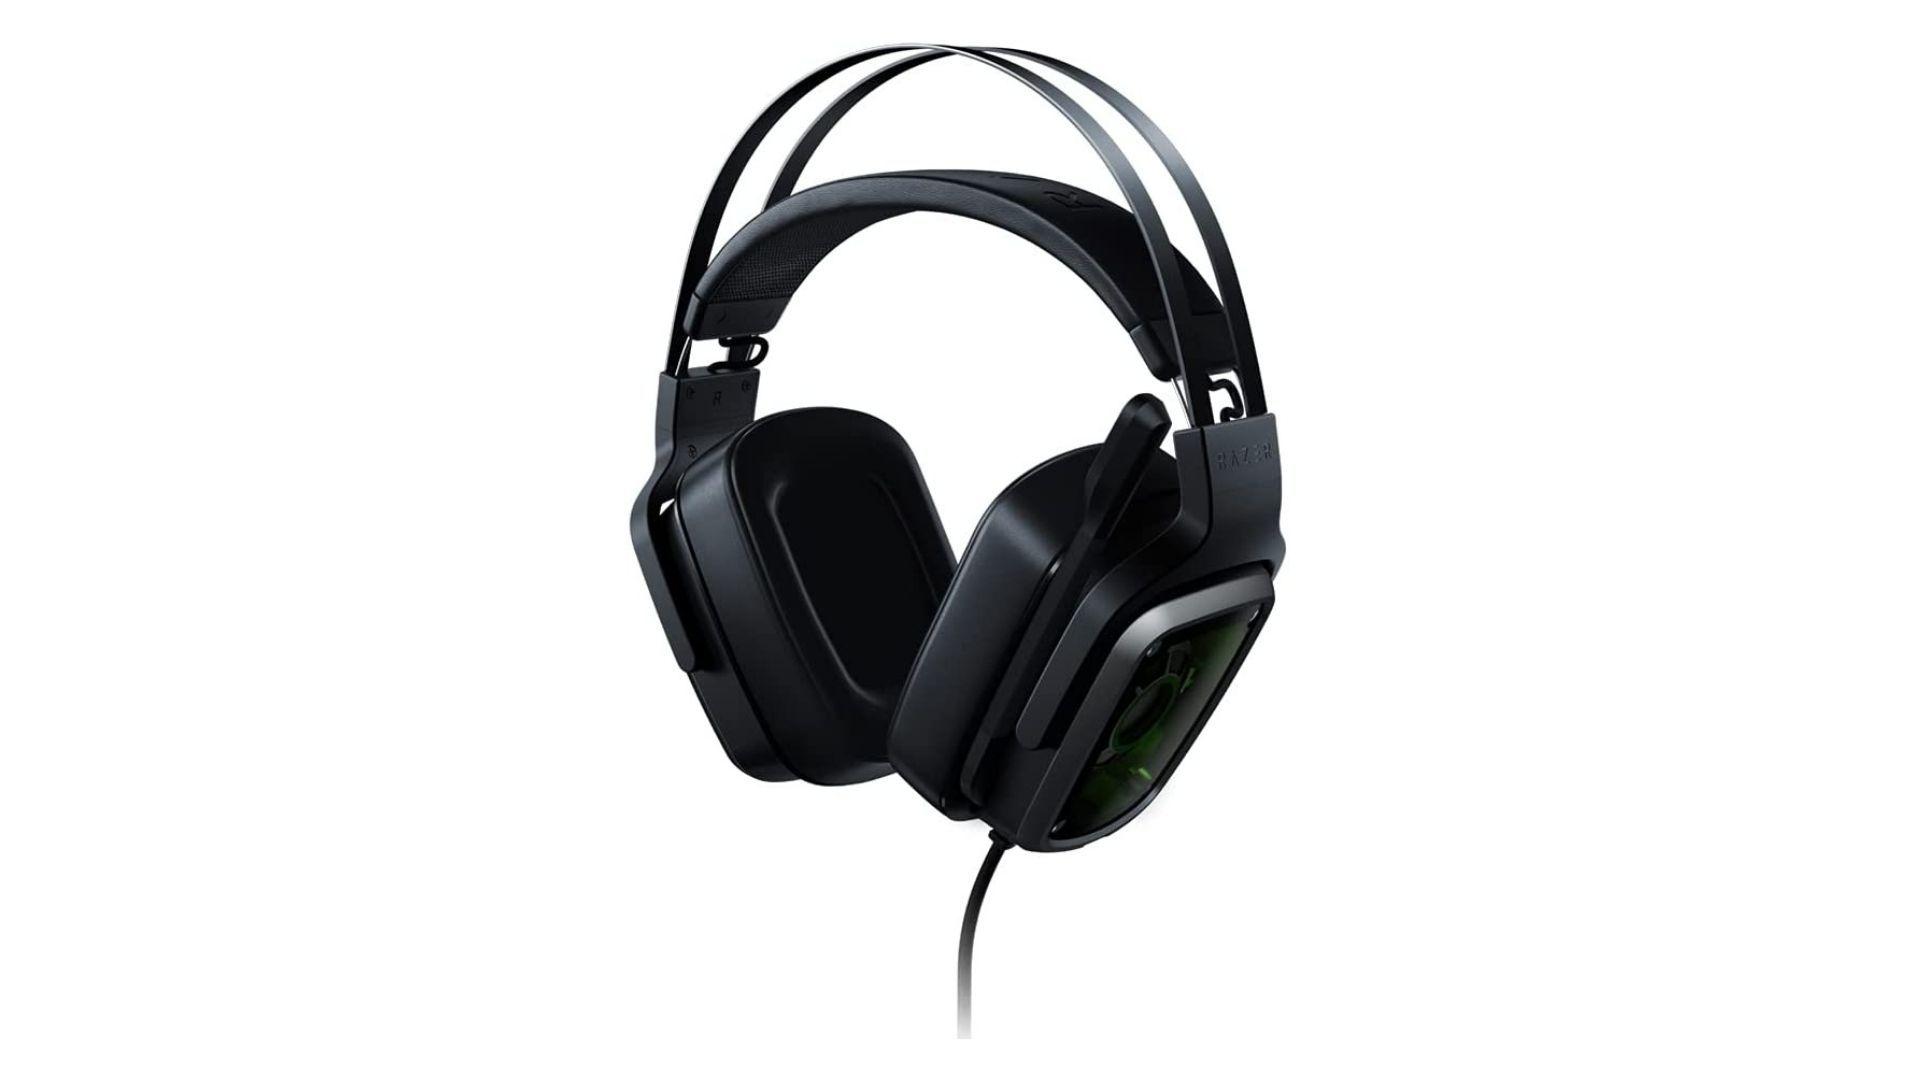 Headset Razer Tiamat 7.1 V2 preto no fundo branco